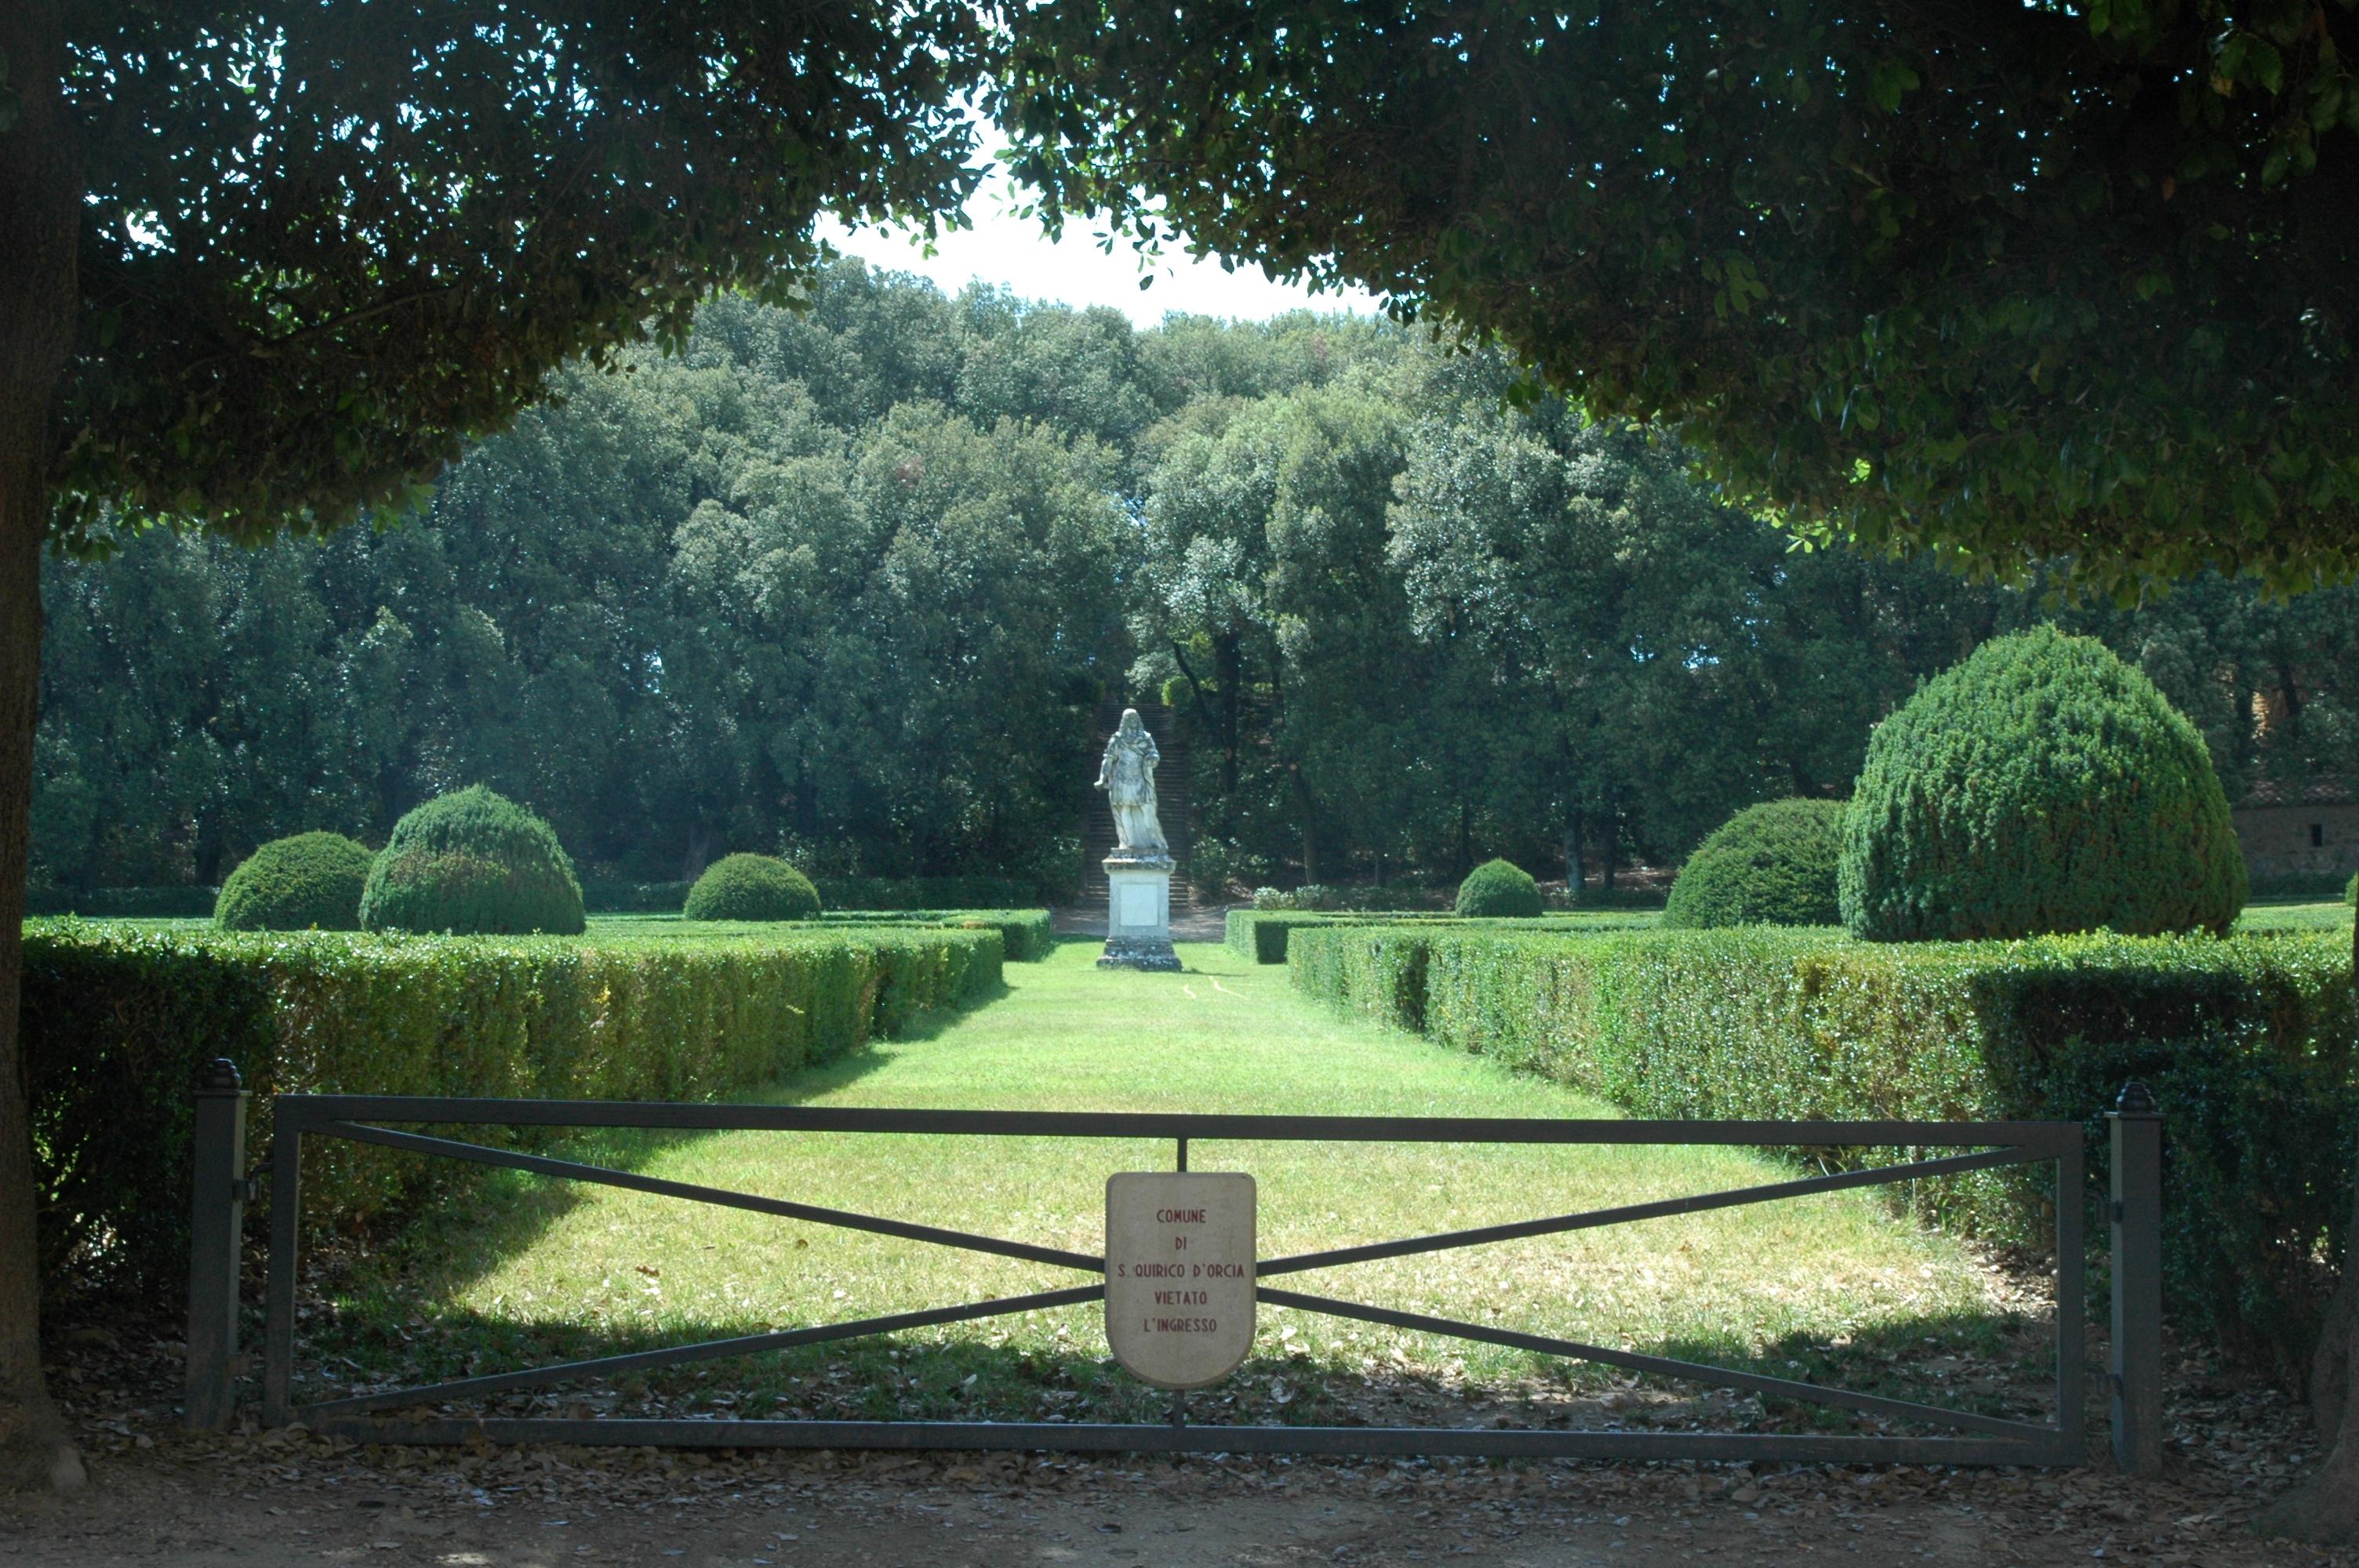 Horti Leonini, San Quirico d'Orcia (SI) - panoramio.jpg